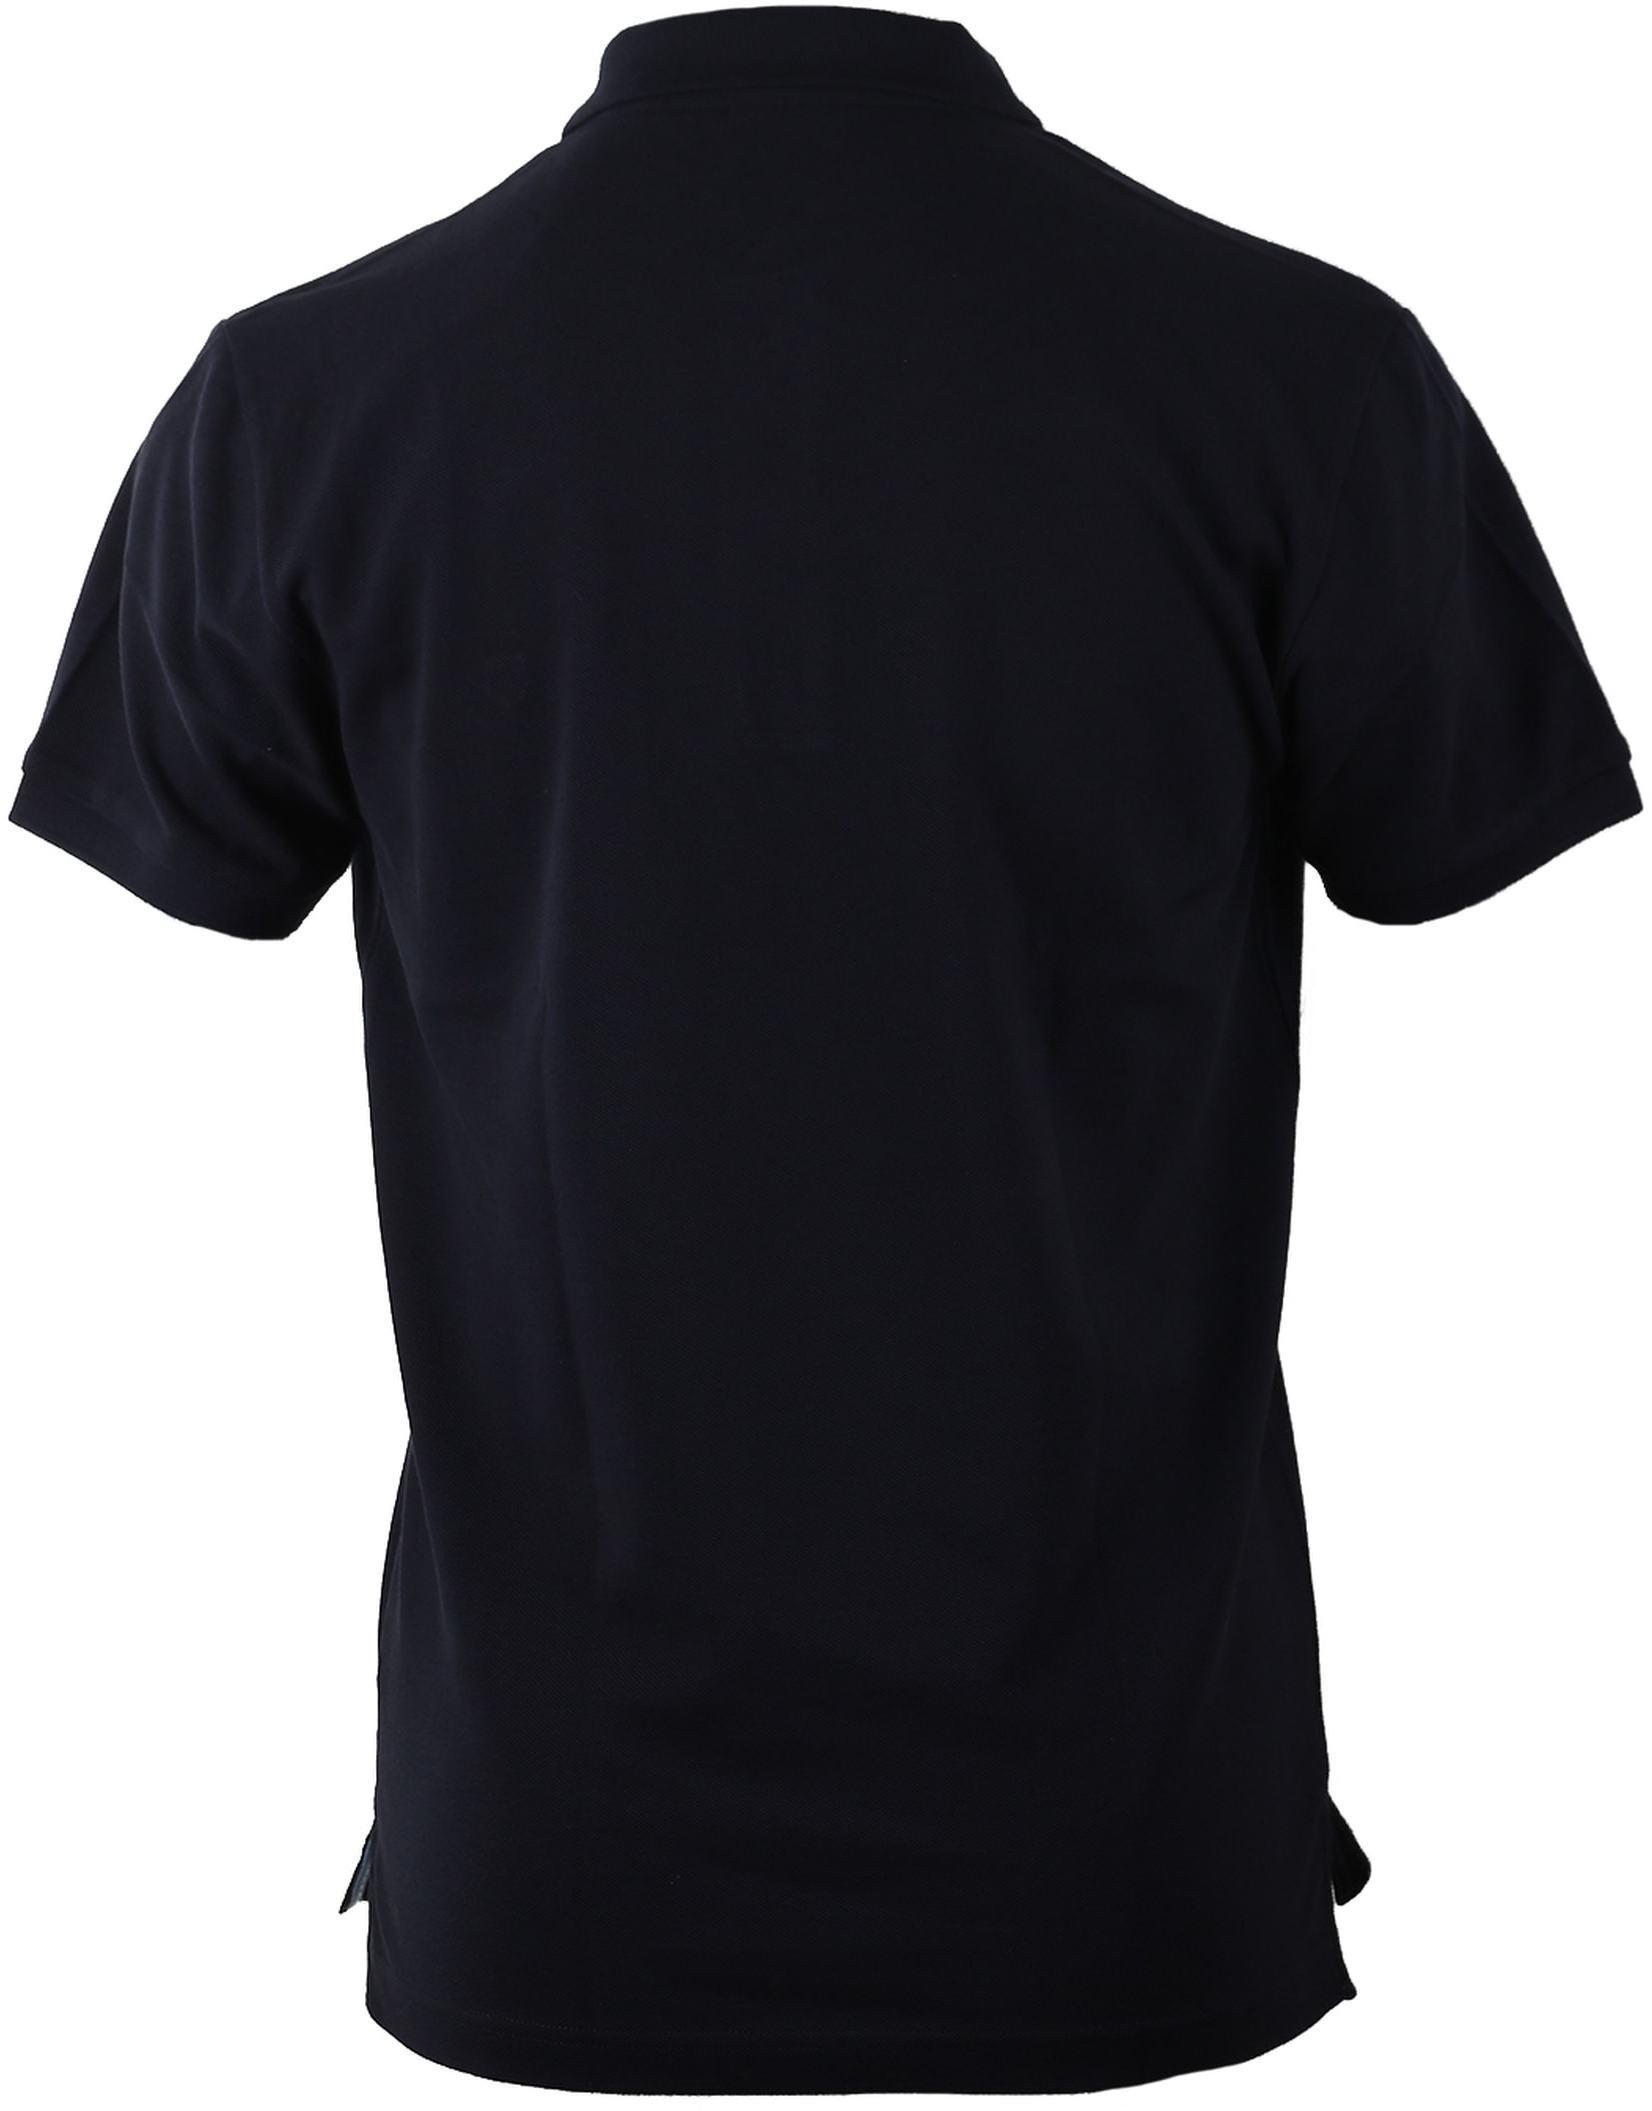 Profuomo Poloshirt Navy foto 1